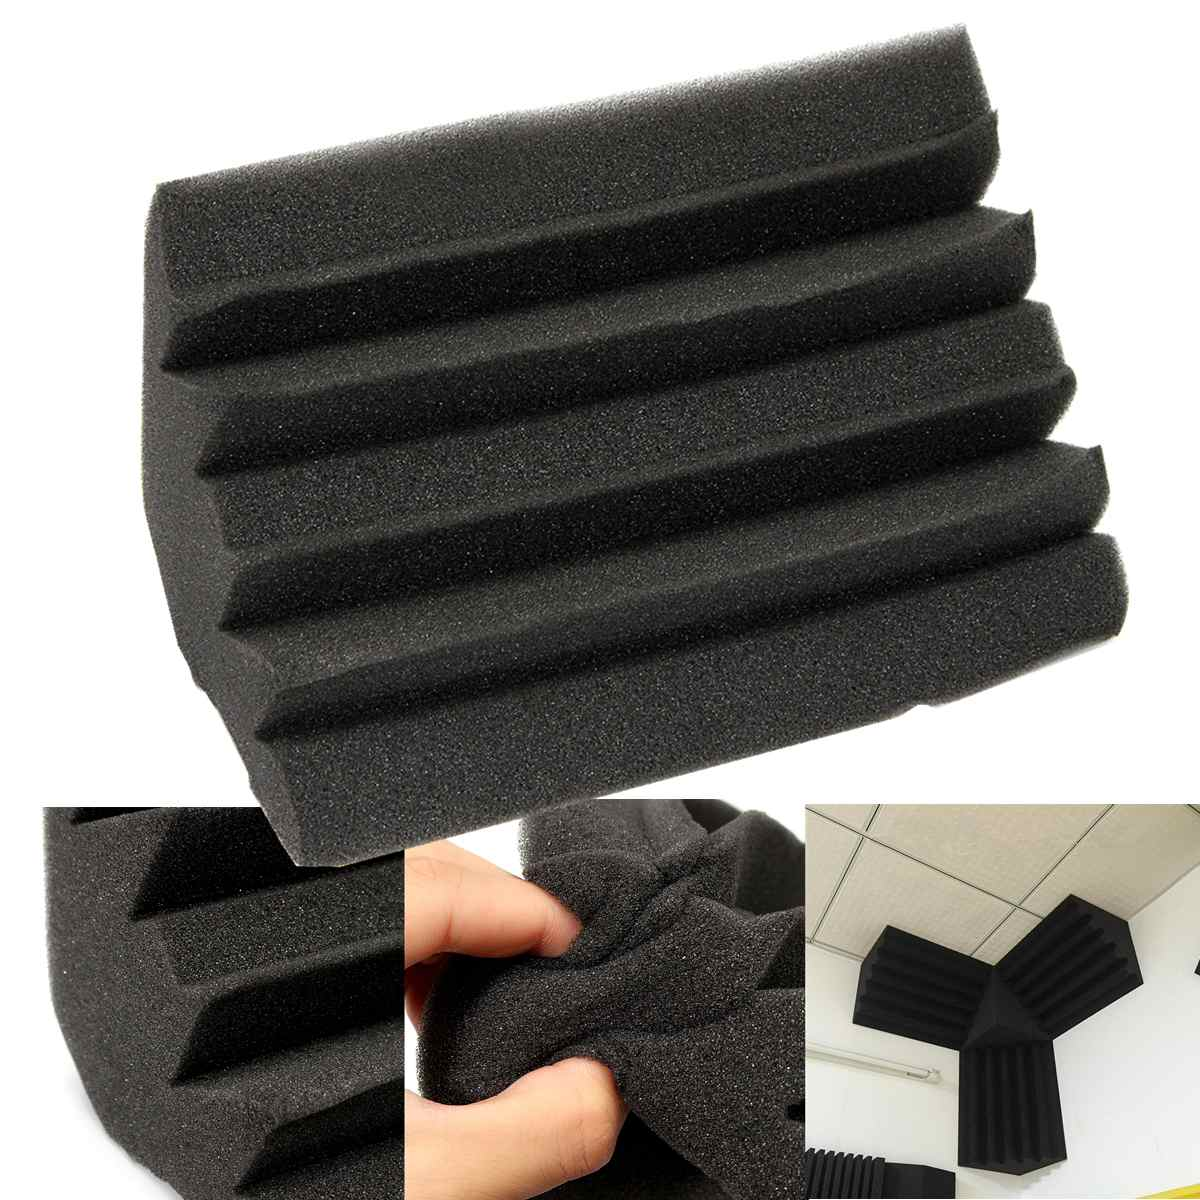 24x12x12cm Mini Corner Sound Absorbing Foam Cotton Corner Bass Traps Studio Foam Panel Sound Absorbing Acoustic Treatment